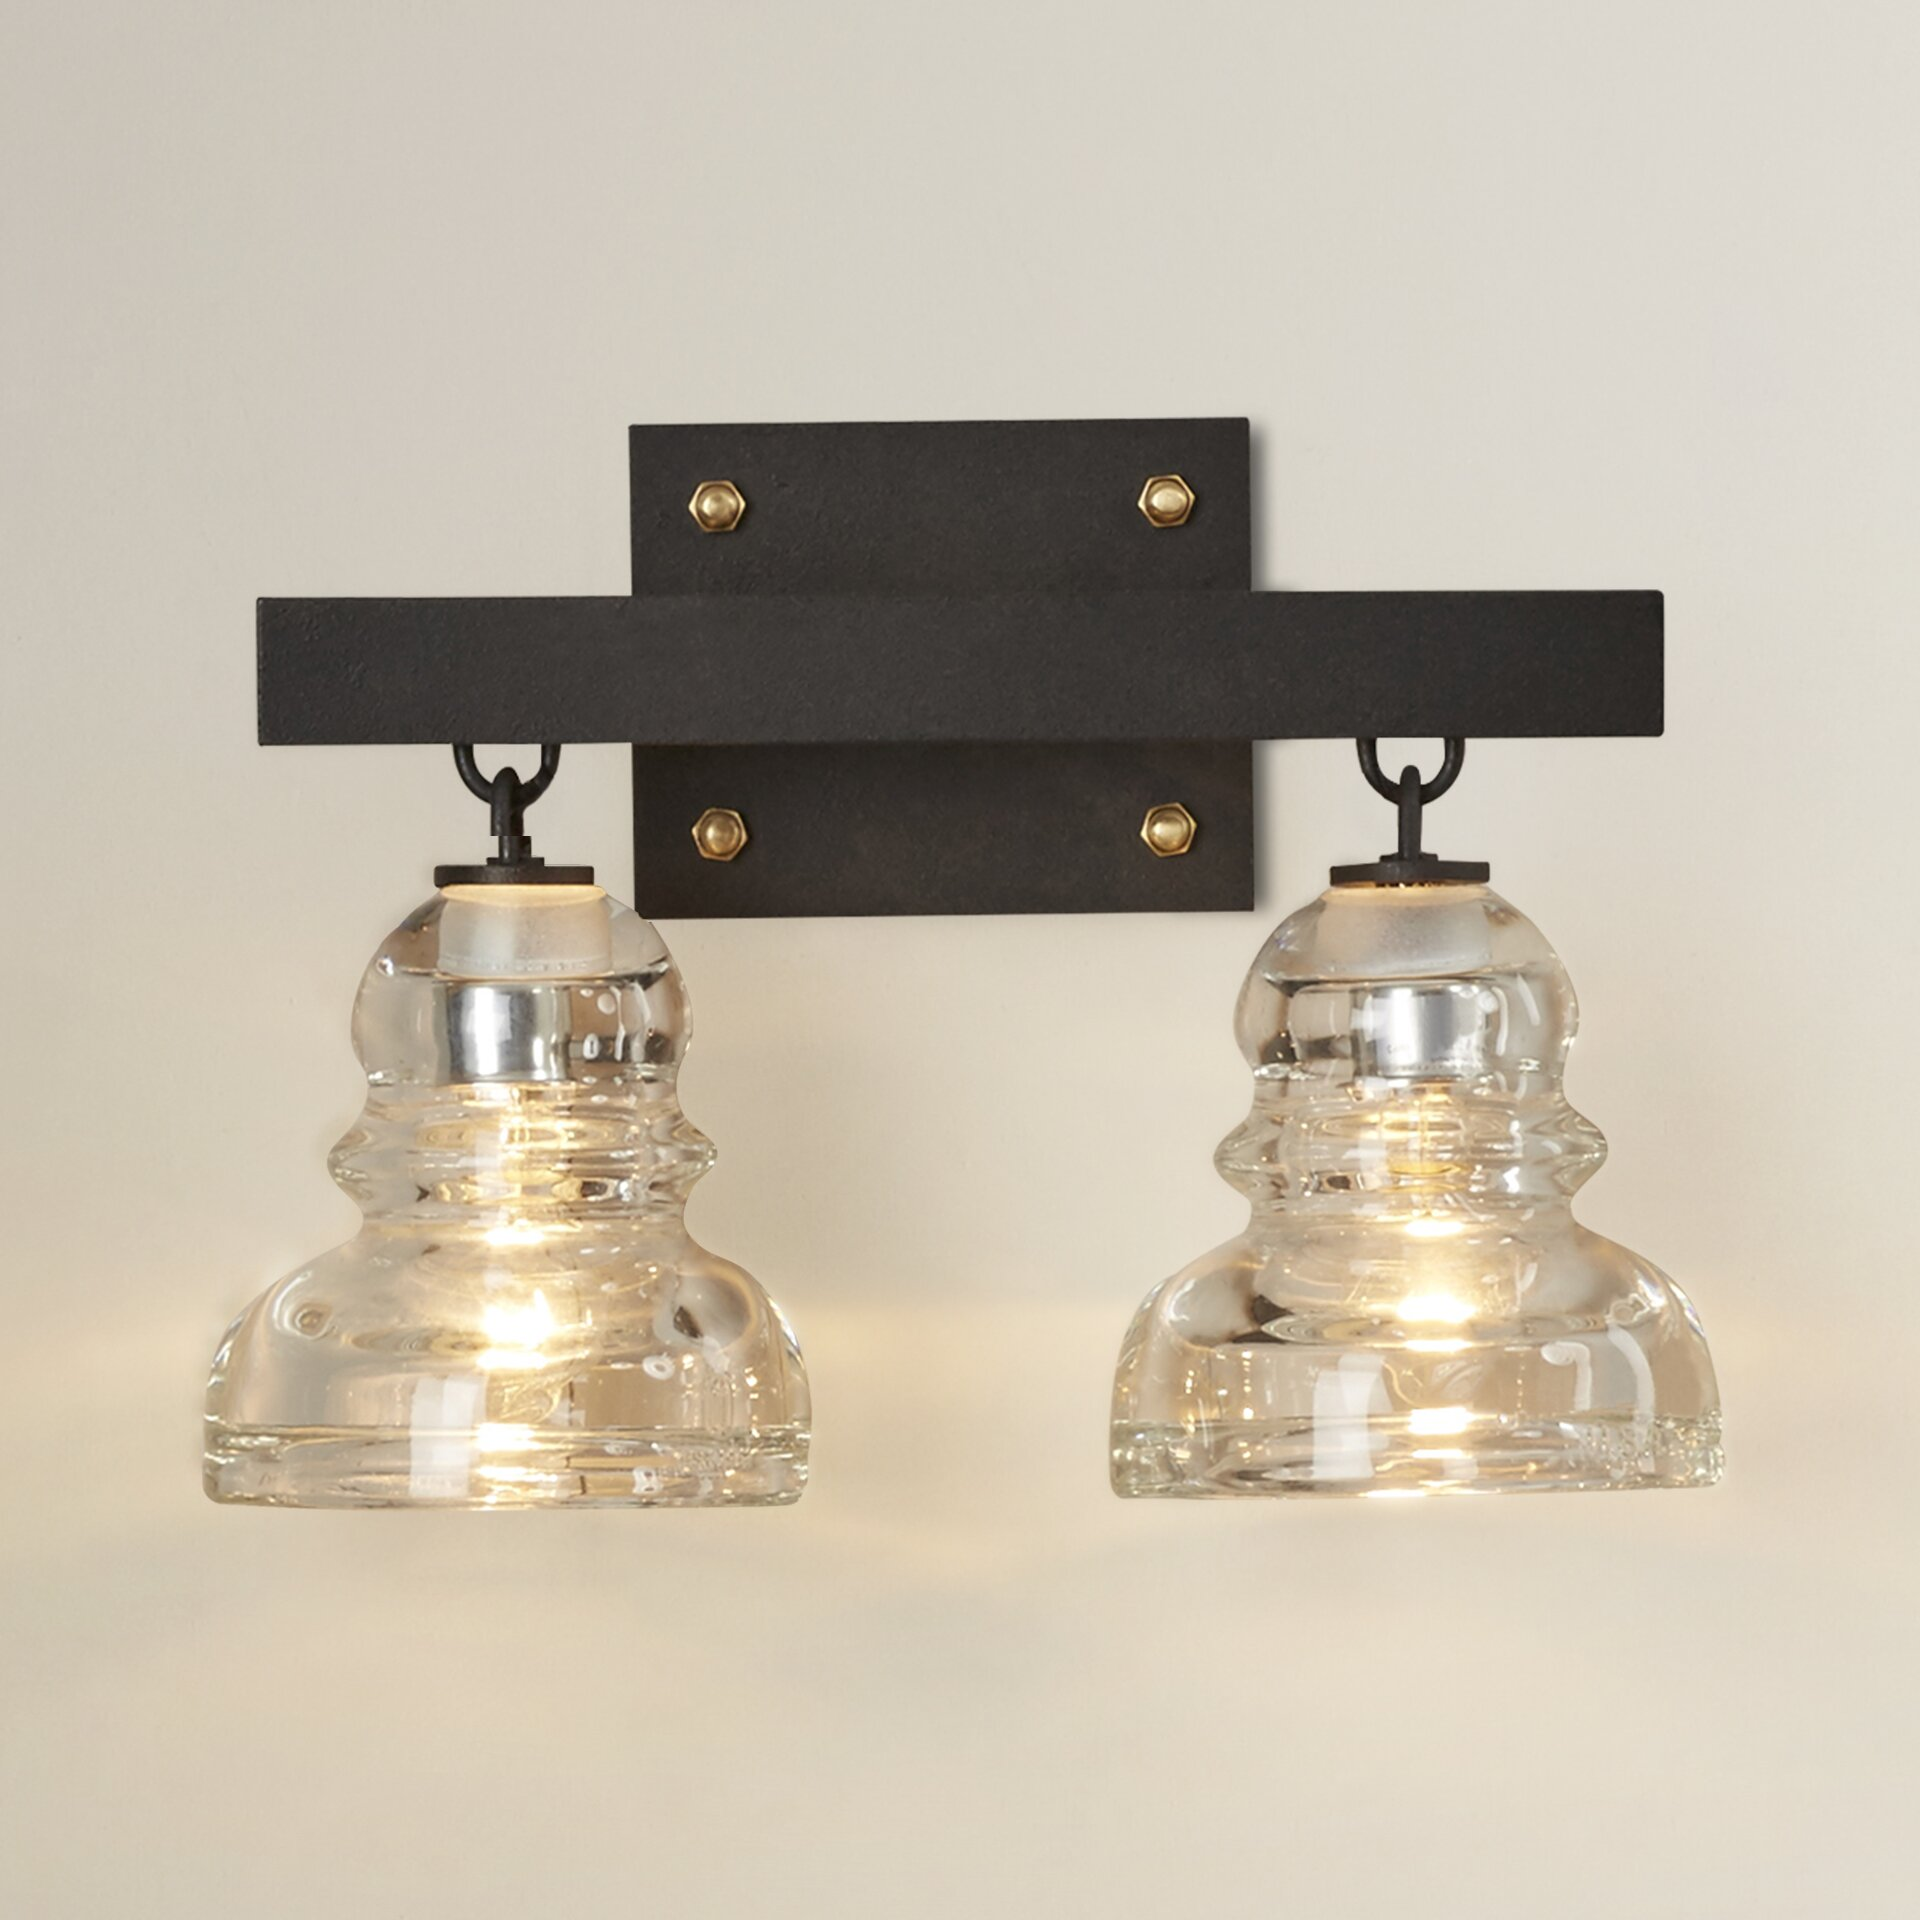 Vintage Bathroom Vanity Lighting Trent Austin Design SKU: TADN2087